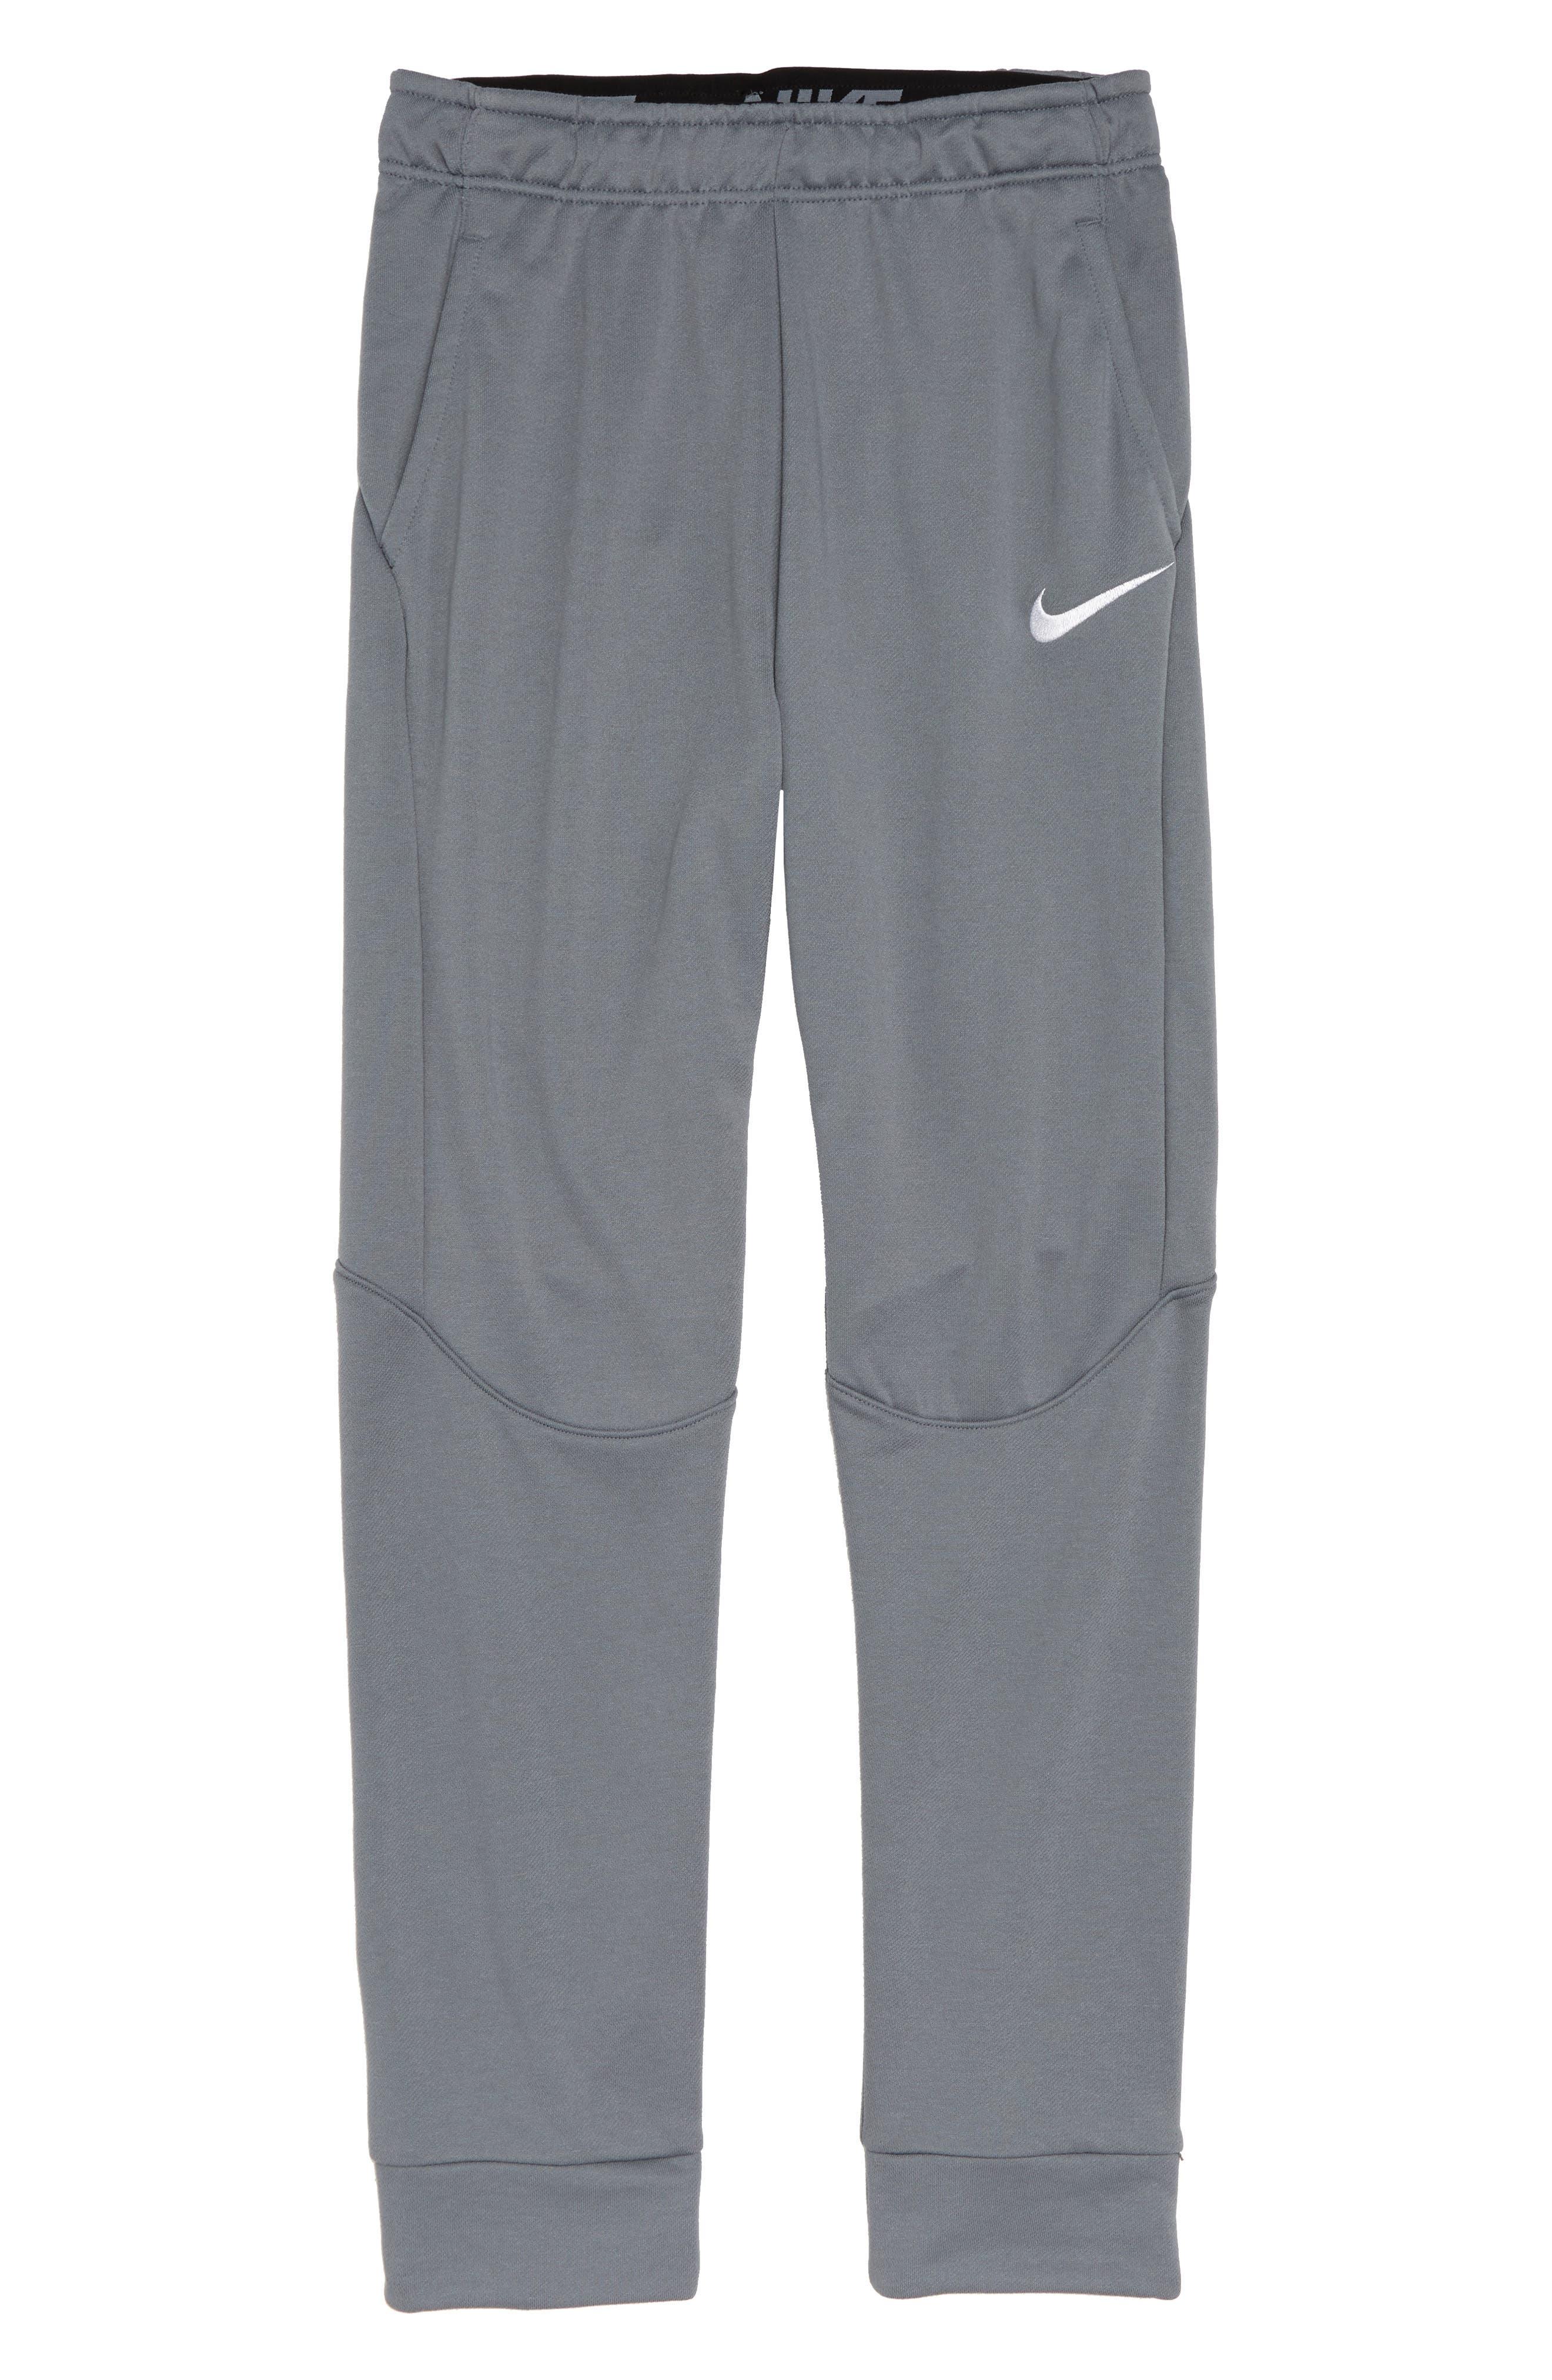 NIKE, Dry Fleece Training Pants, Main thumbnail 1, color, COOL GREY/ WHITE